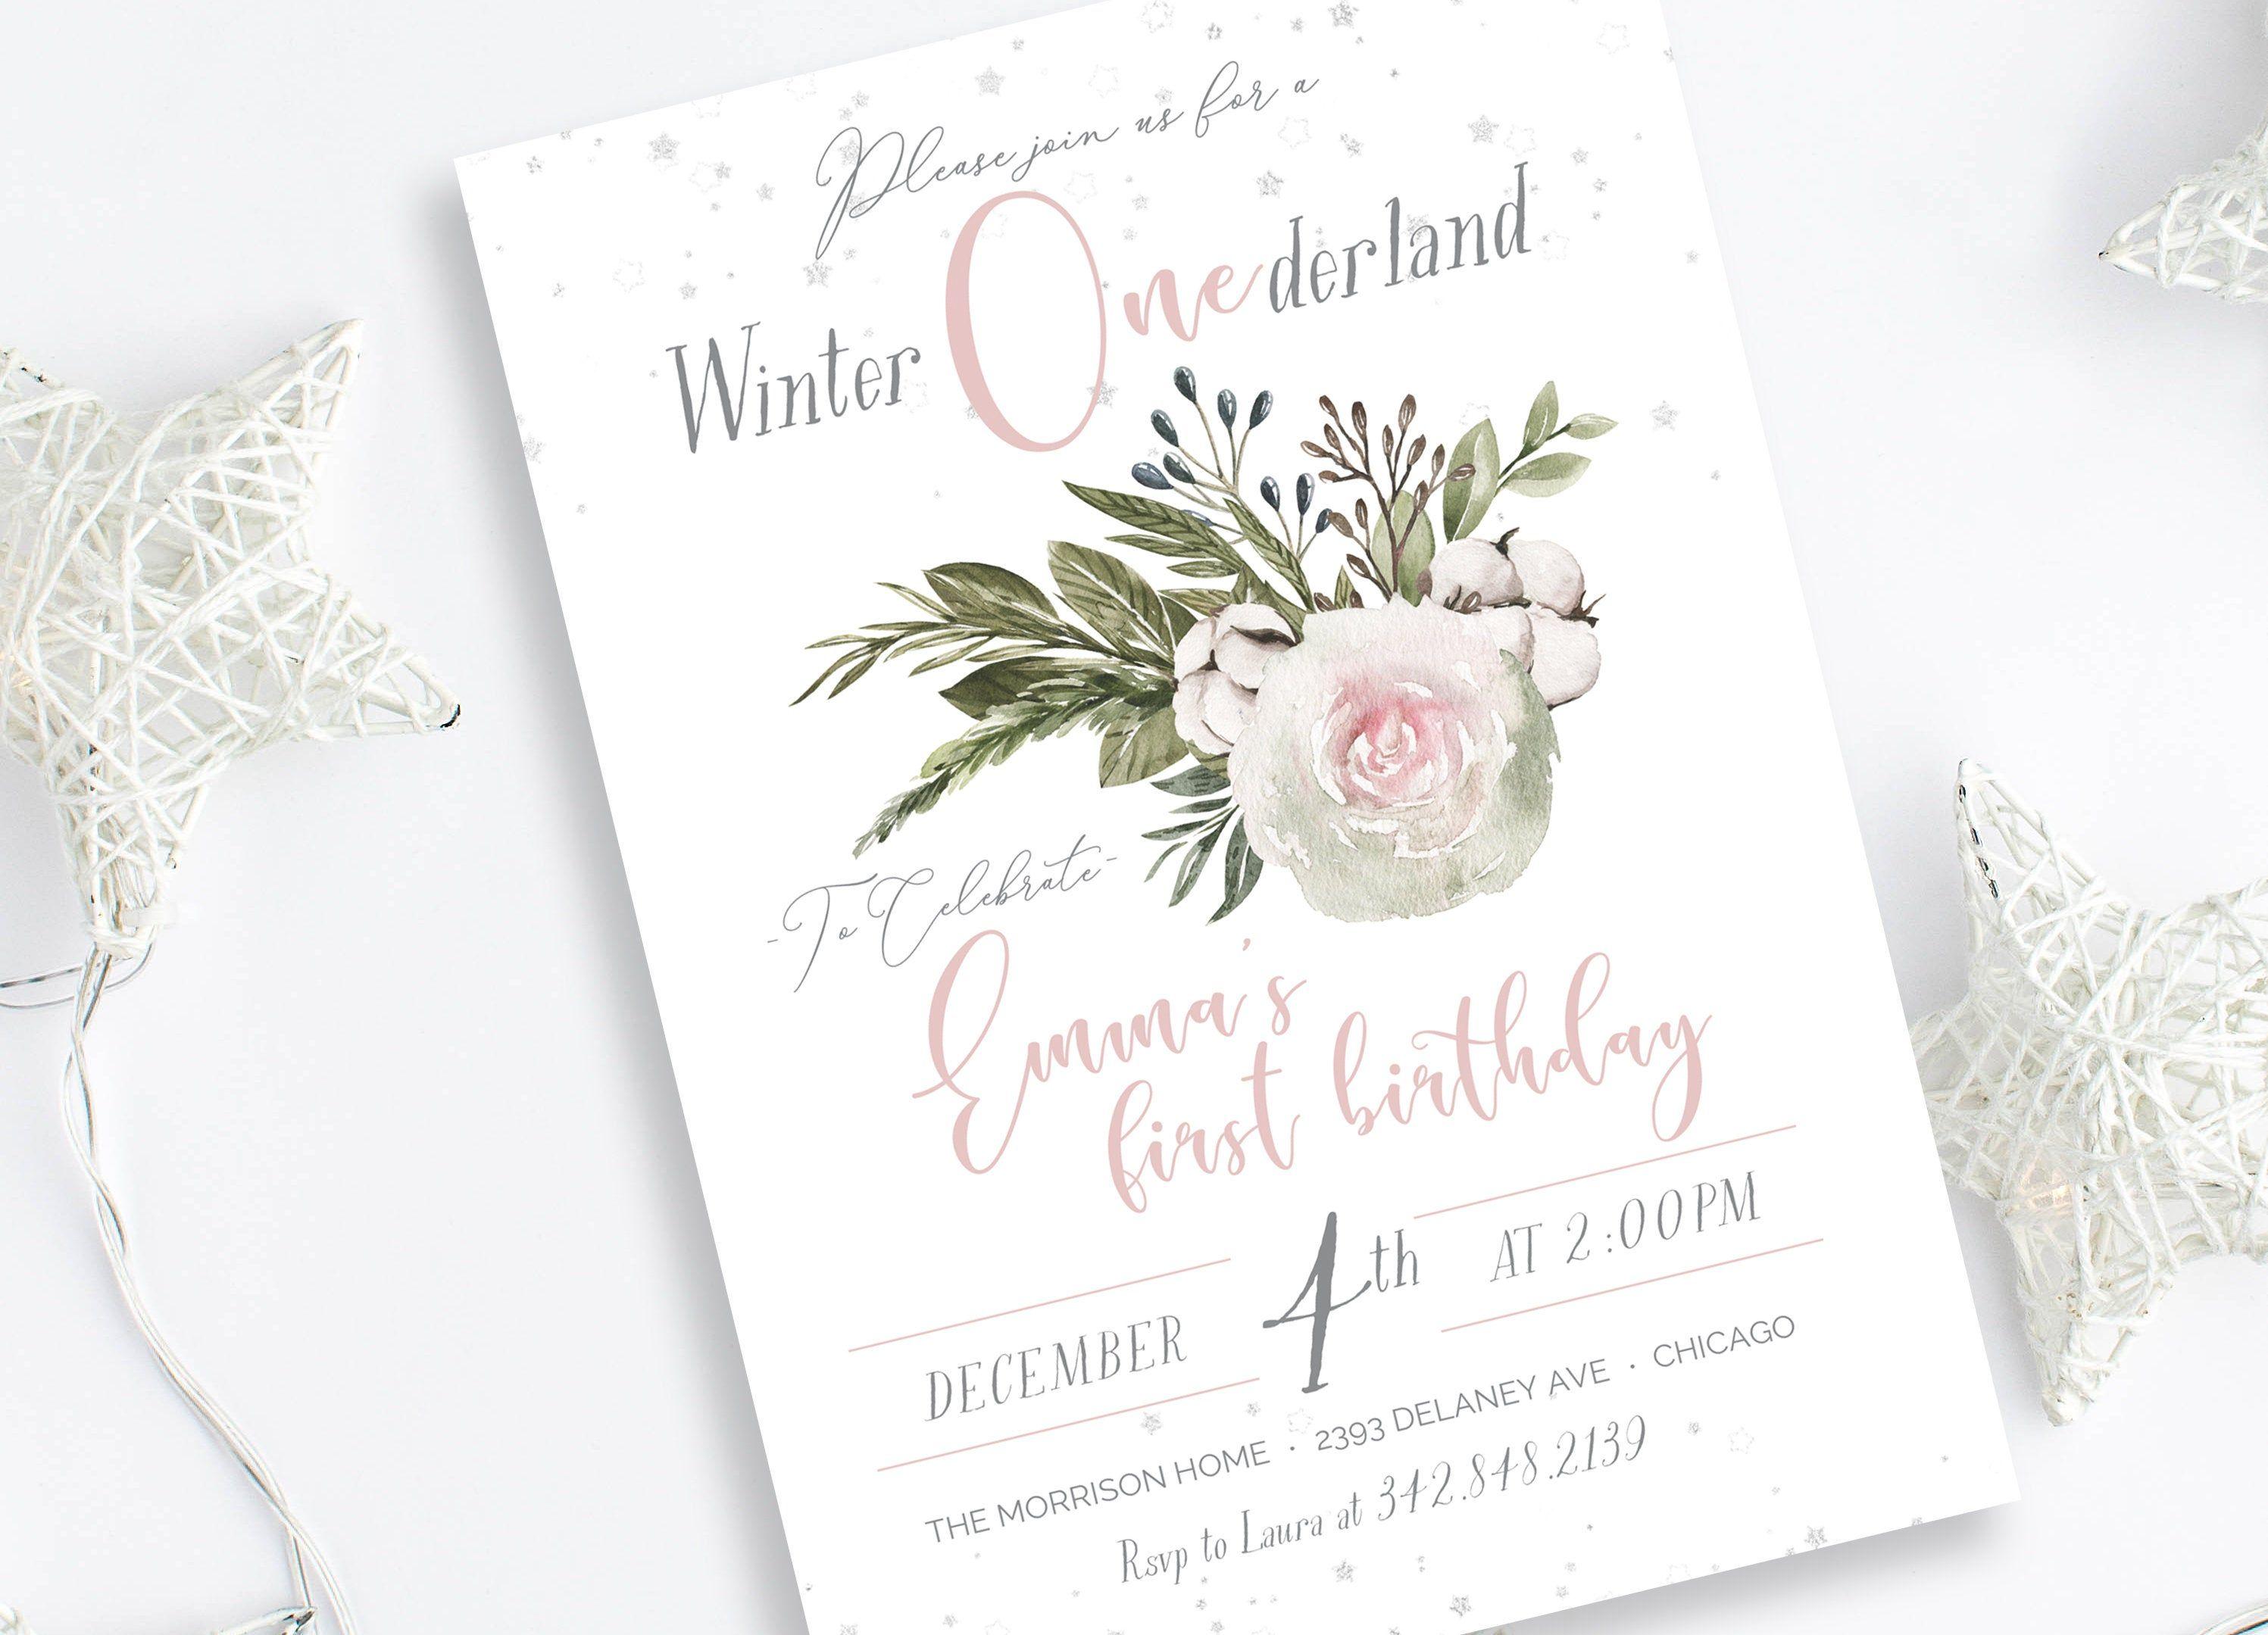 Winter Onederland Birthday Invitation Template First Birthday Etsy Winter Onederland Birthday Invitations Winter Onederland Birthday First Birthday Invitations